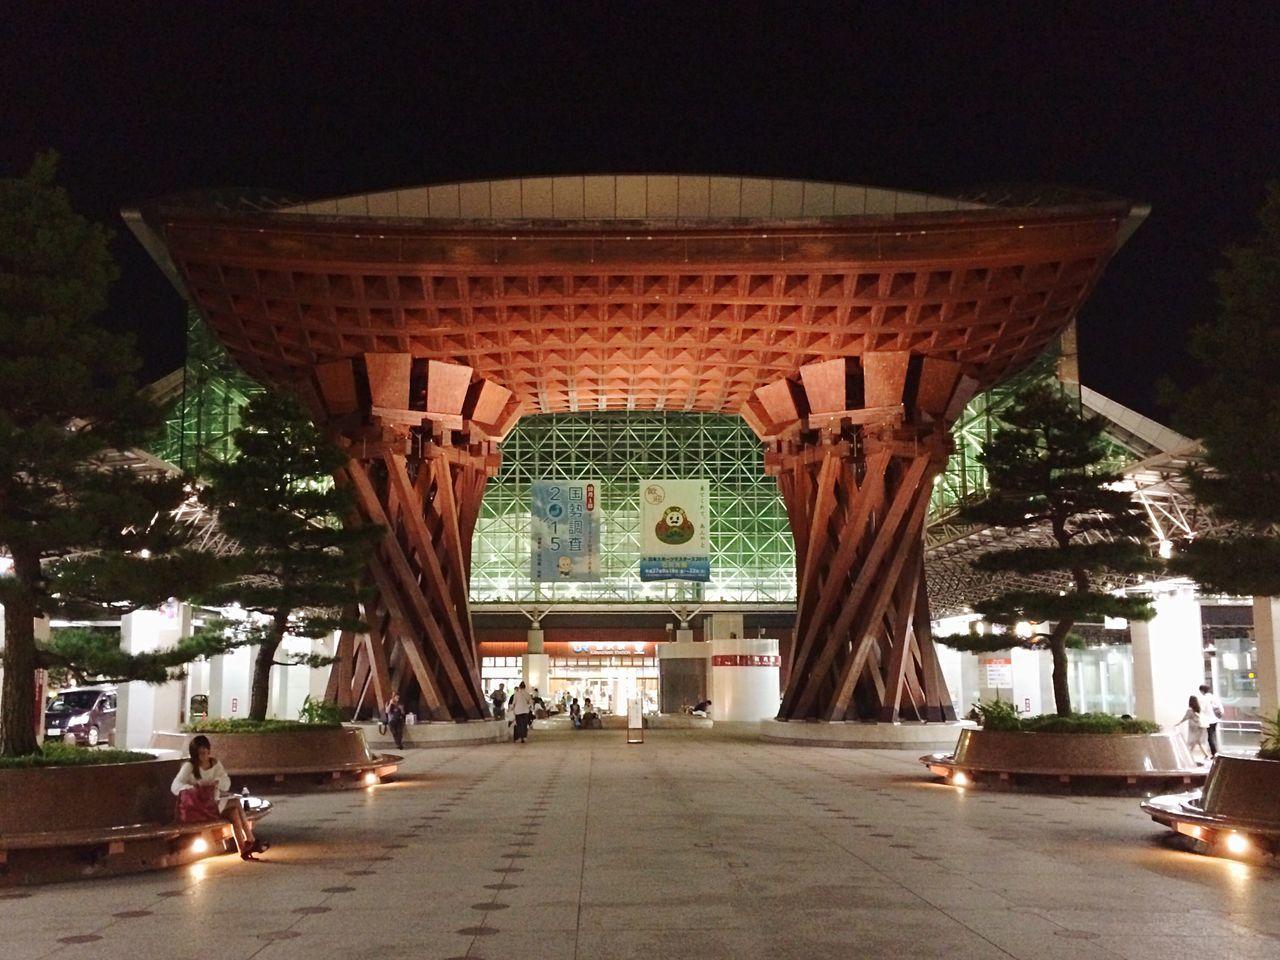 金沢駅 駅 夜 建築物 Kanazawa Station Kanazawa Ishikawa-ken Kanazawa,japan Station Night Night Lights Nightphotography Night Photography Night View Architecture Architecture_collection